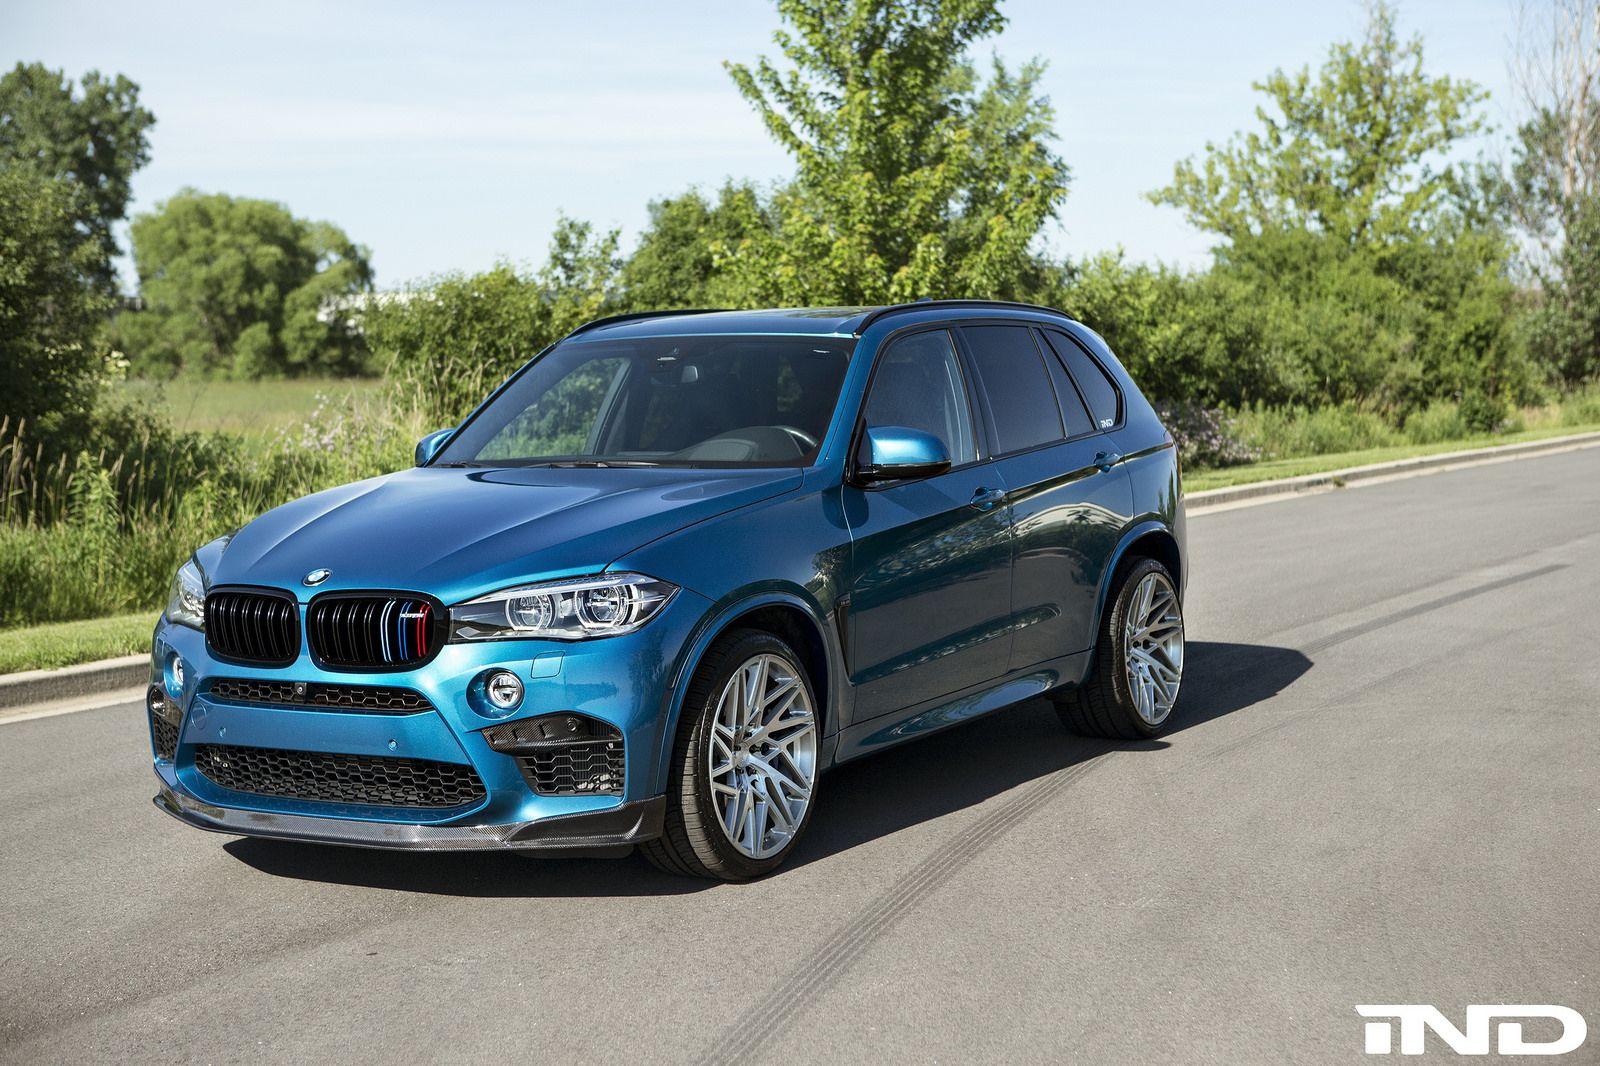 2014 5 bmw x5 m amp x6 m f85 f86 page 5 - Nice Bmw Bmw X6 M 2017 F86 Crossover Blue X6 German Cars Bmw Car Check More At Http 24car Top 2017 2017 04 22 Bmw Bmw X6 M 2017 F86 Cr